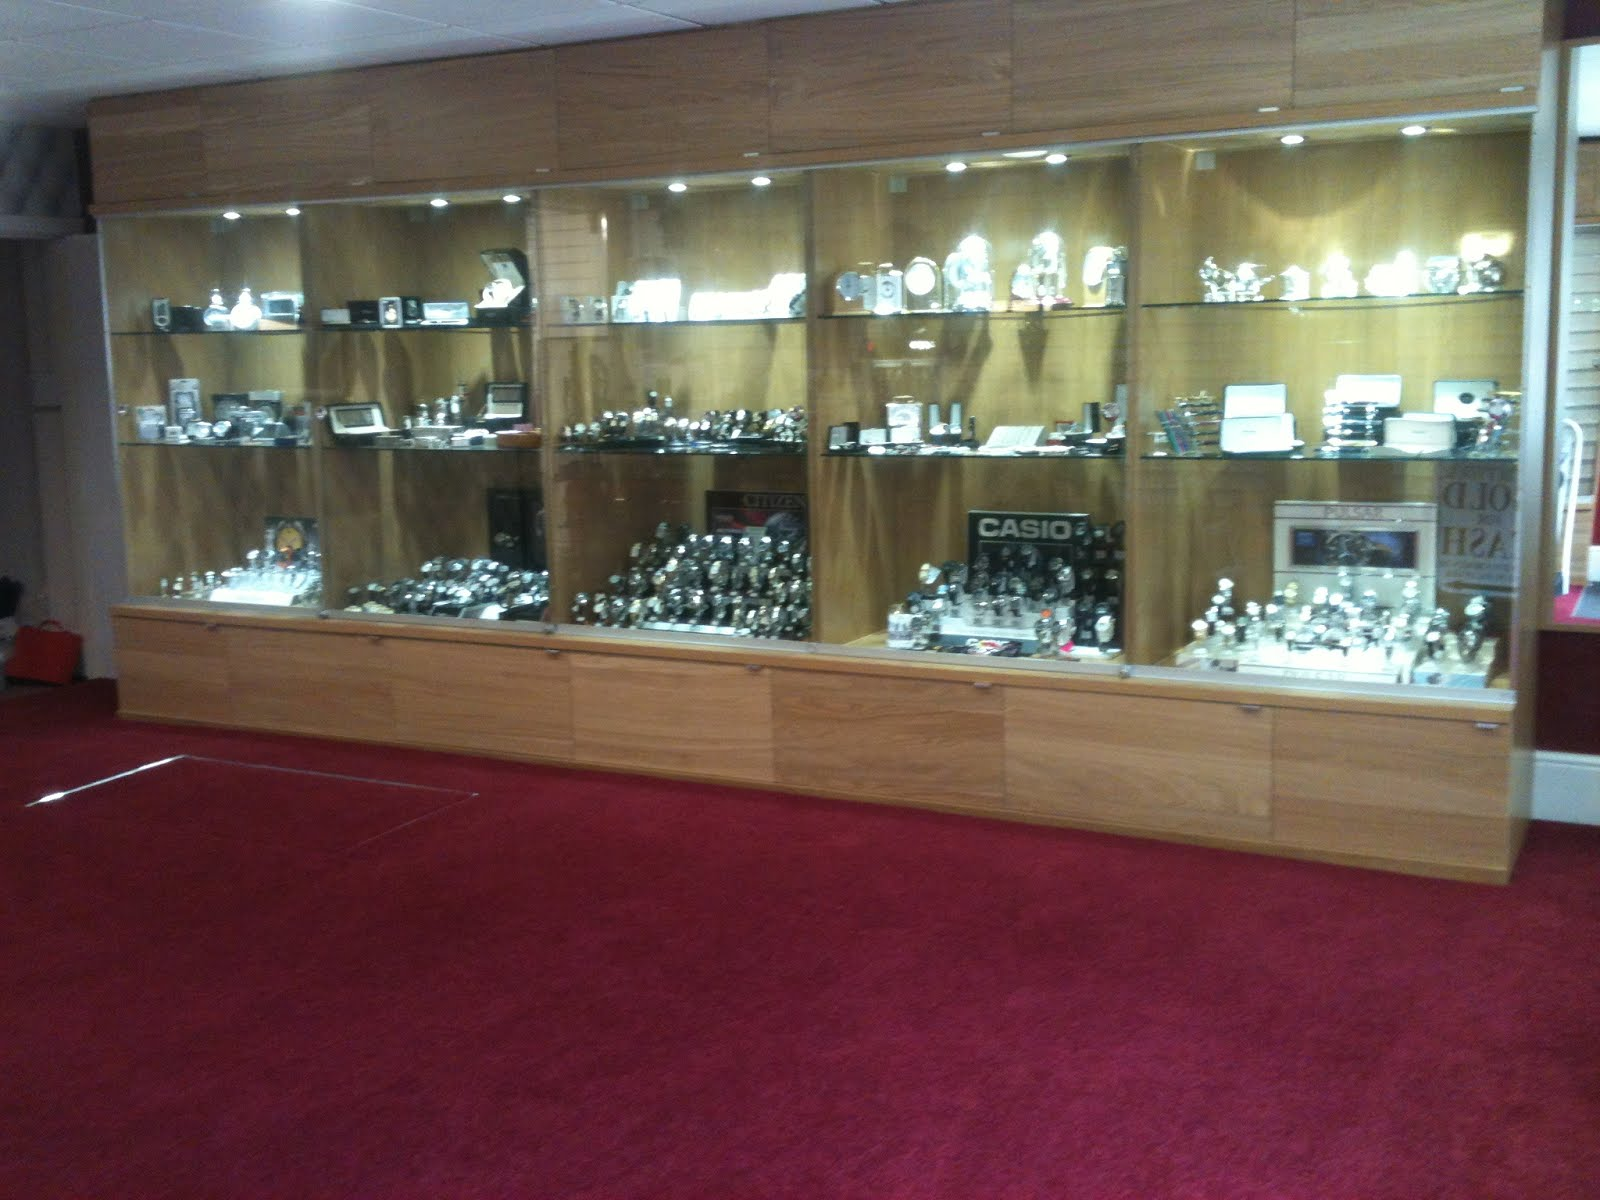 Pax wardrobe as jewellery shop display cabinets - IKEA ...